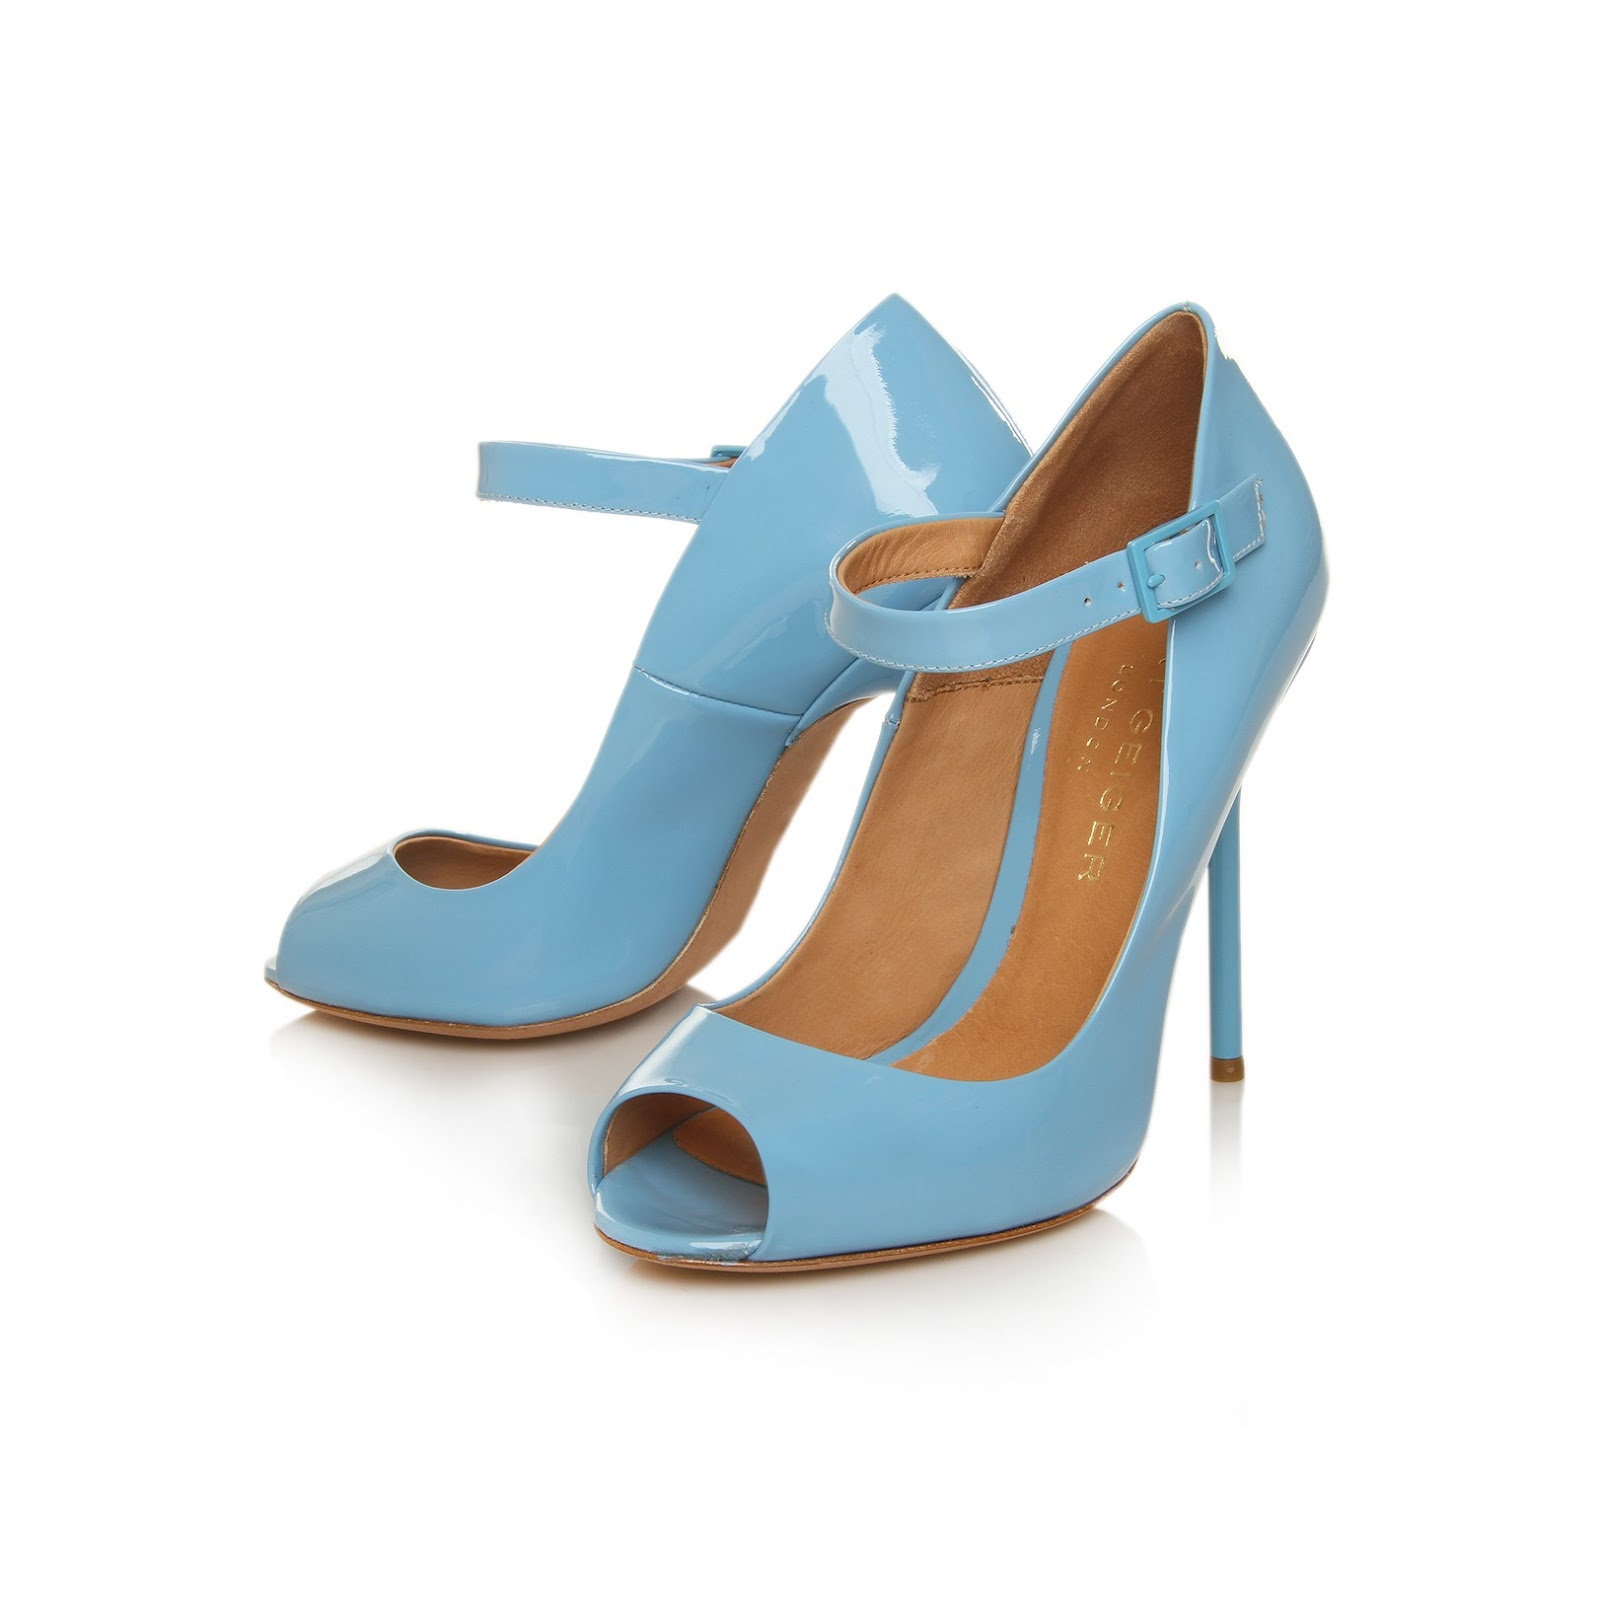 kurt geiger sky blue class high heel shoes fashion detective